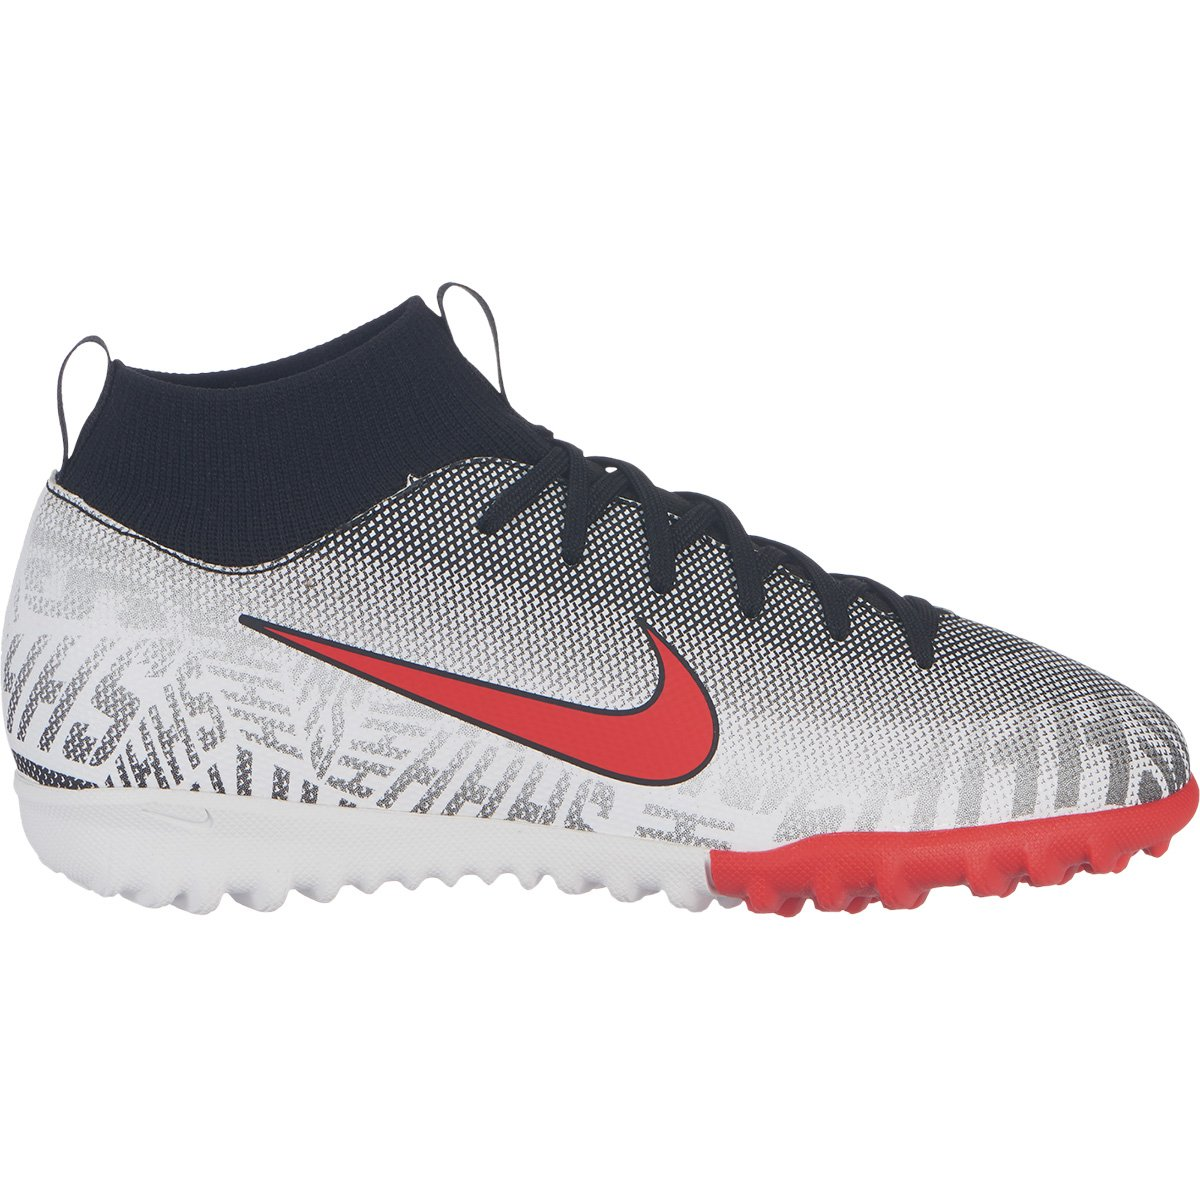 8384b9c402 Chuteira Society Infantil Nike Mercurial Superfly 6 Academy Gs Njr TF ...